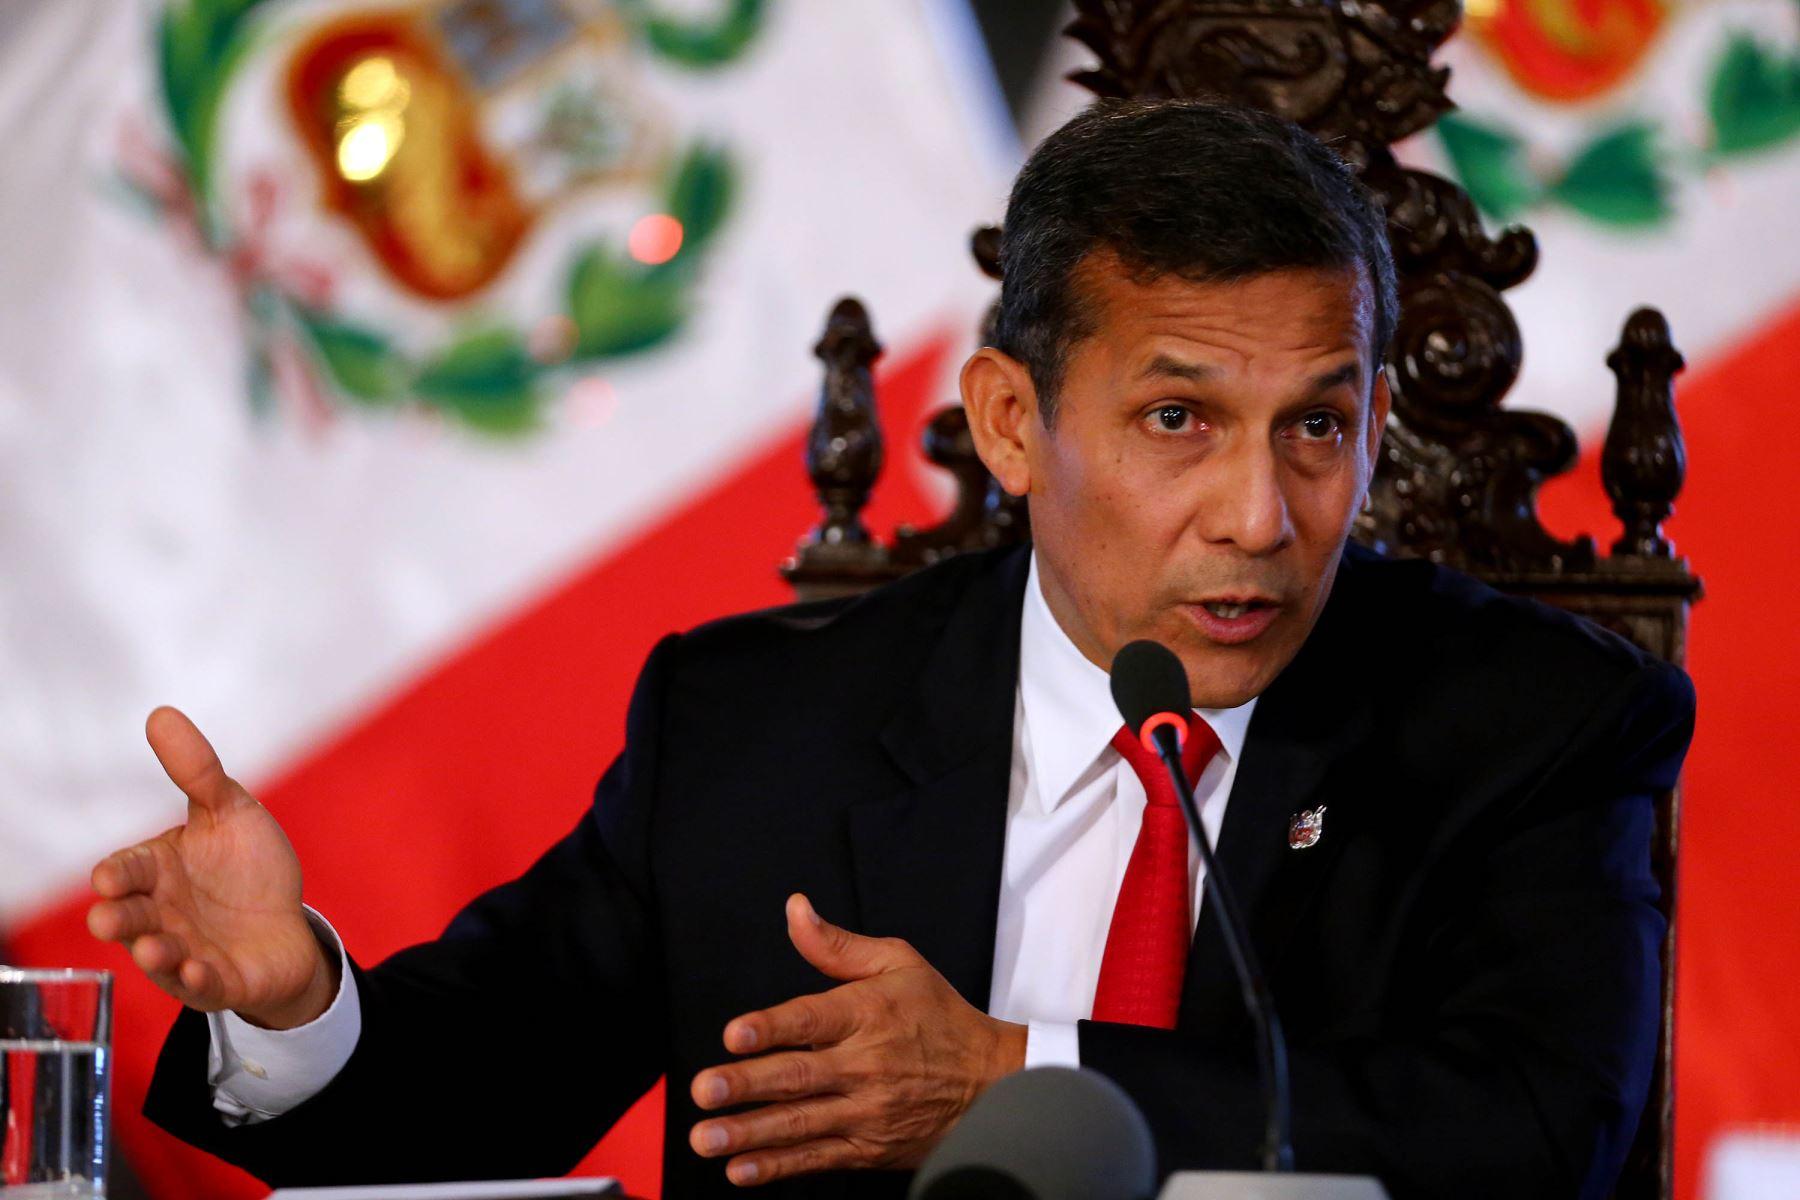 Conferencia del presidente Ollanta Humala con Prensa Extranjera.Foto: ANDINA/Prensa Presidencia